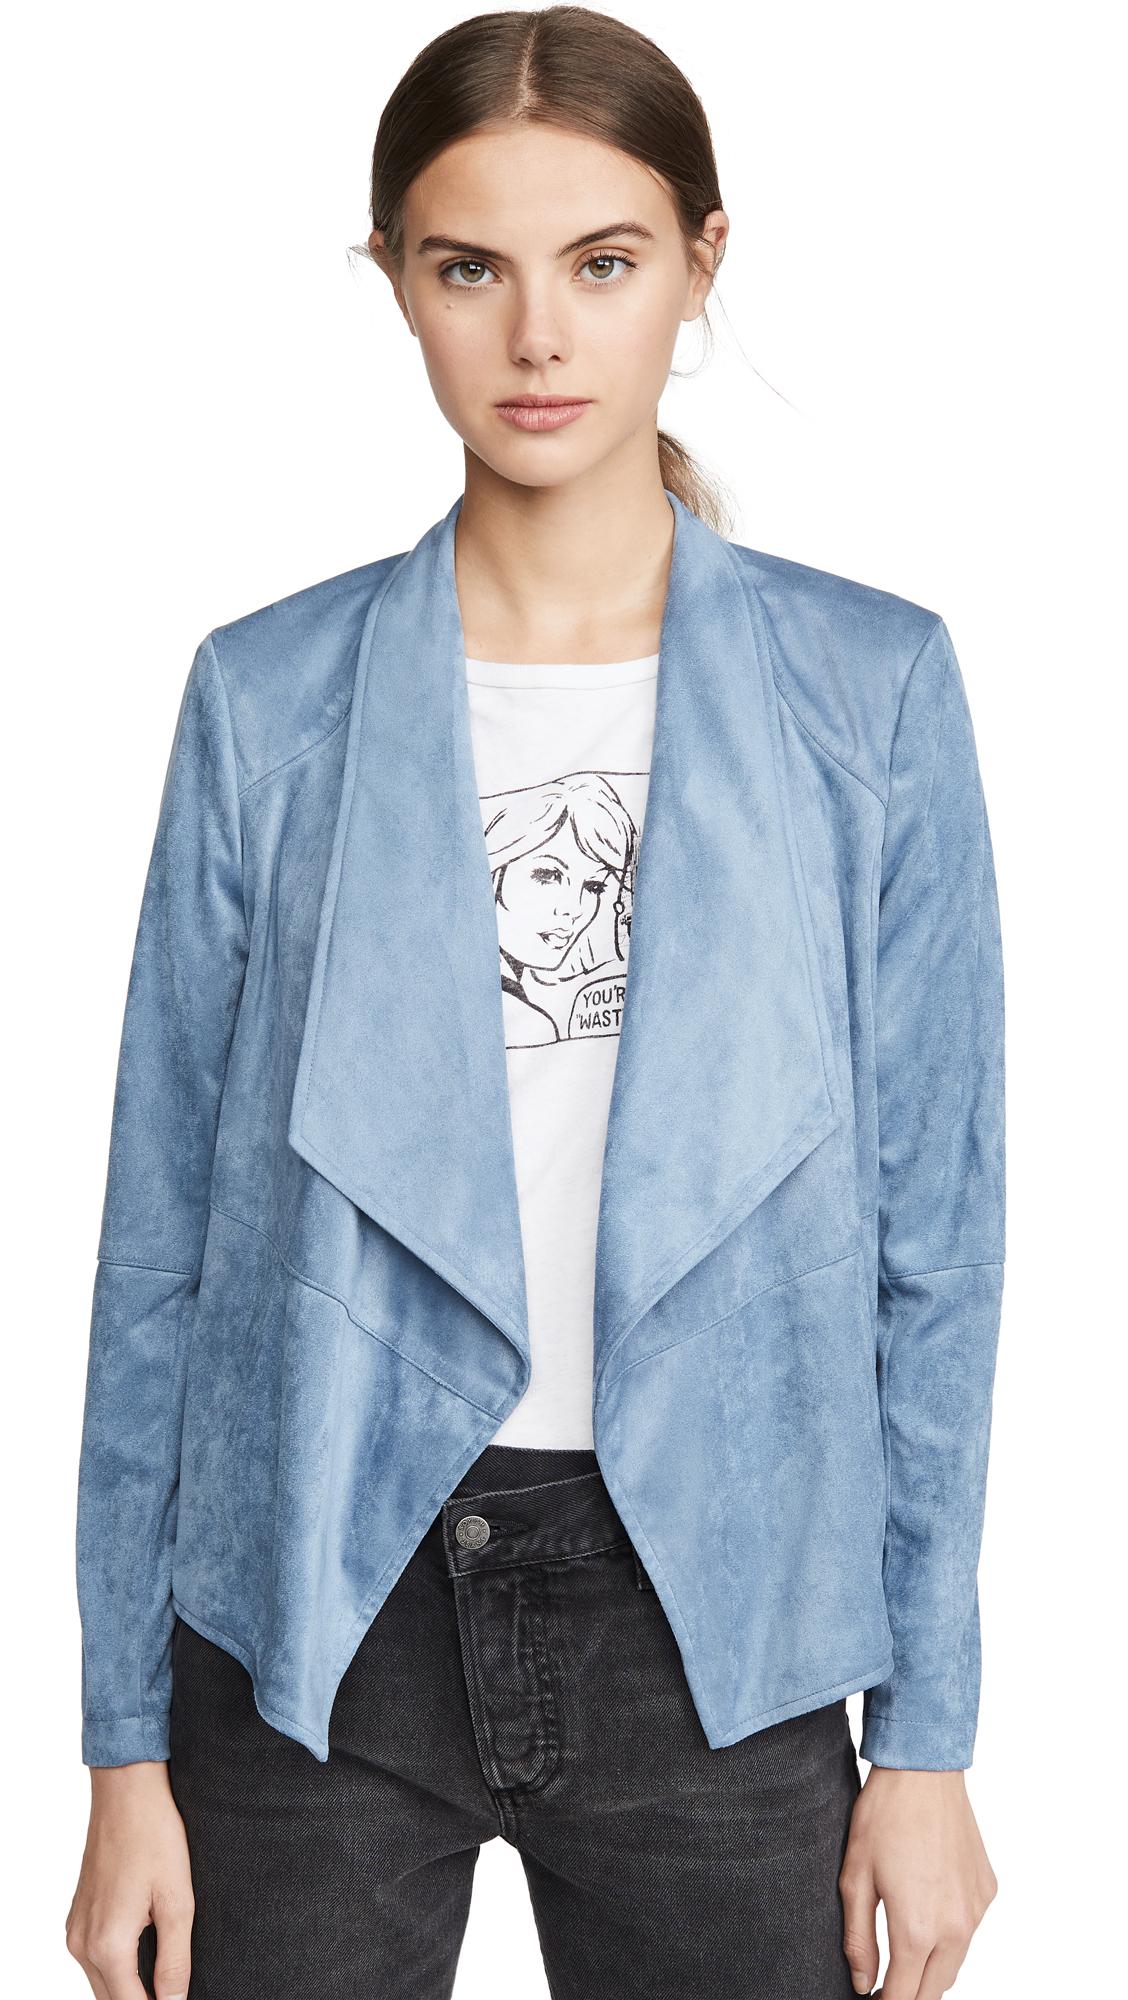 Buy BB Dakota Faux Suede It Out Jacket online beautiful BB Dakota Jackets, Coats, Coats